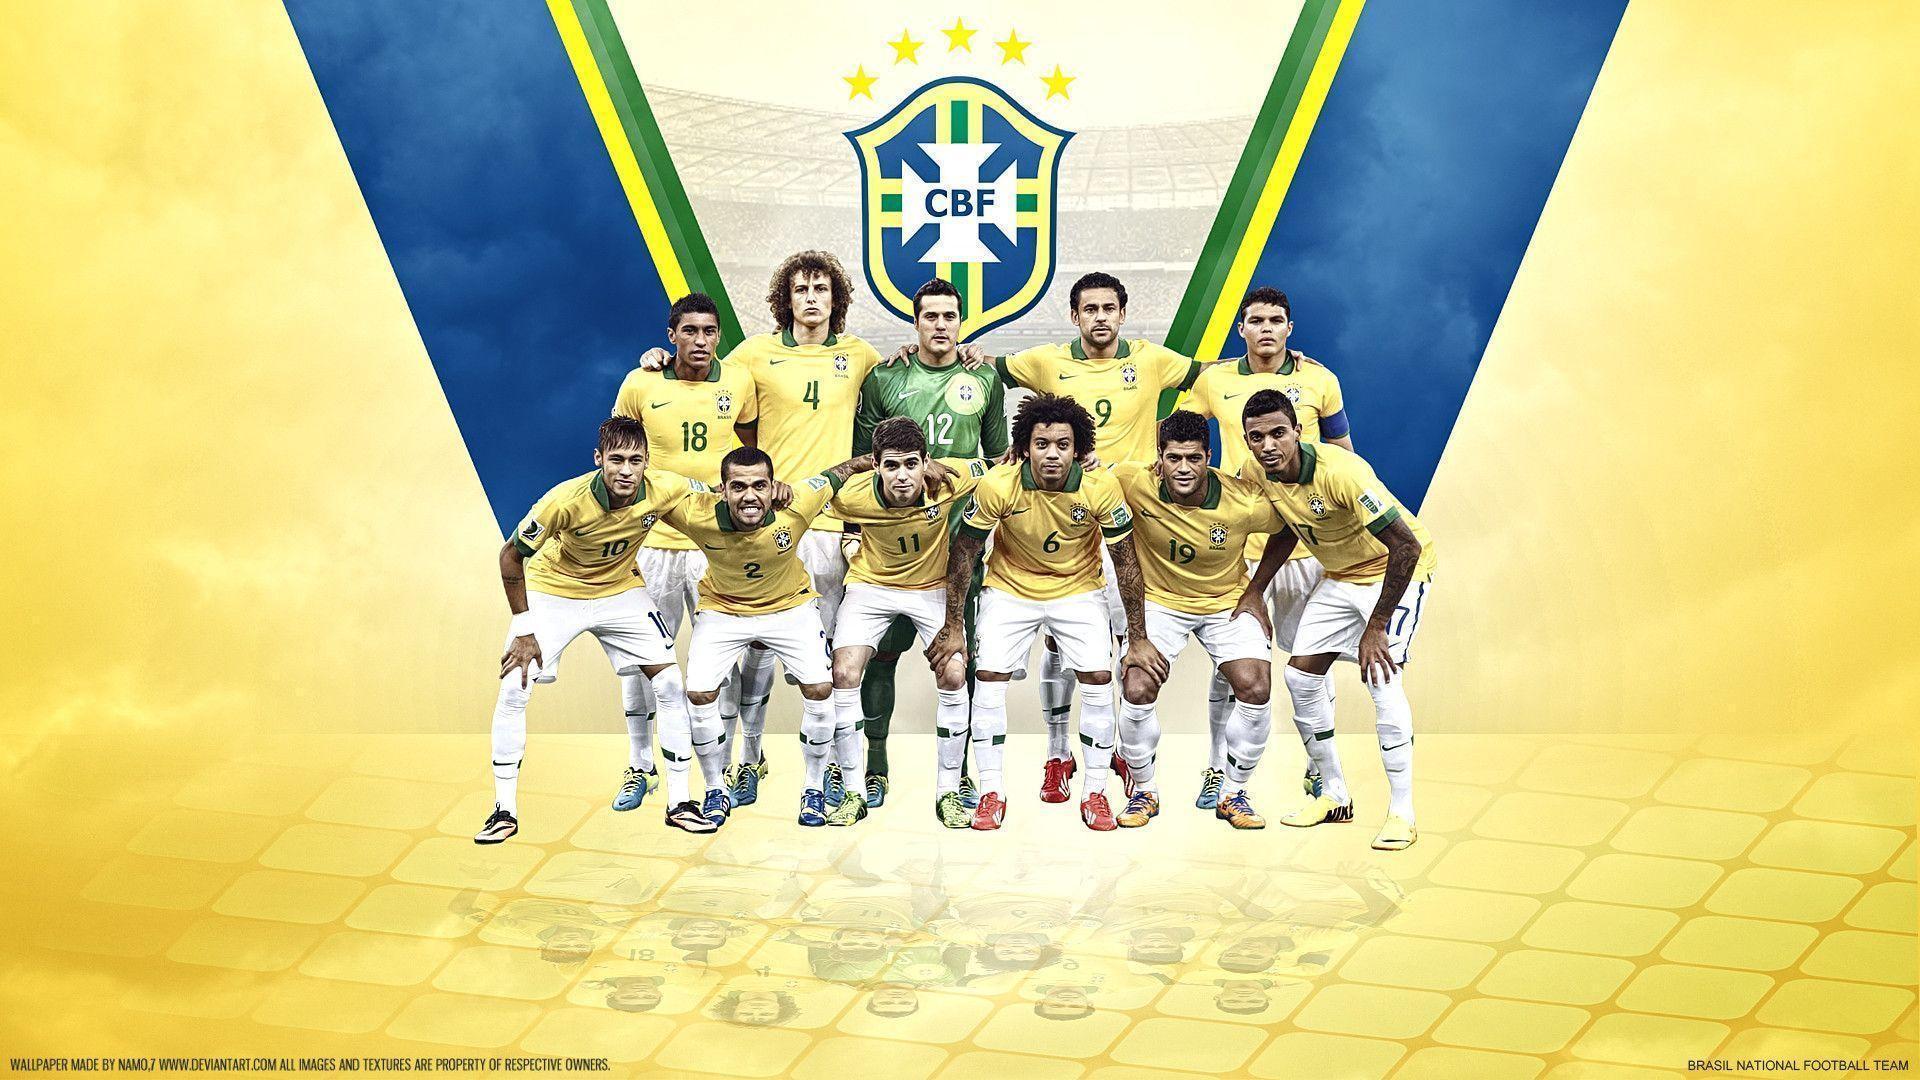 football brazil wallpaper stars - photo #36